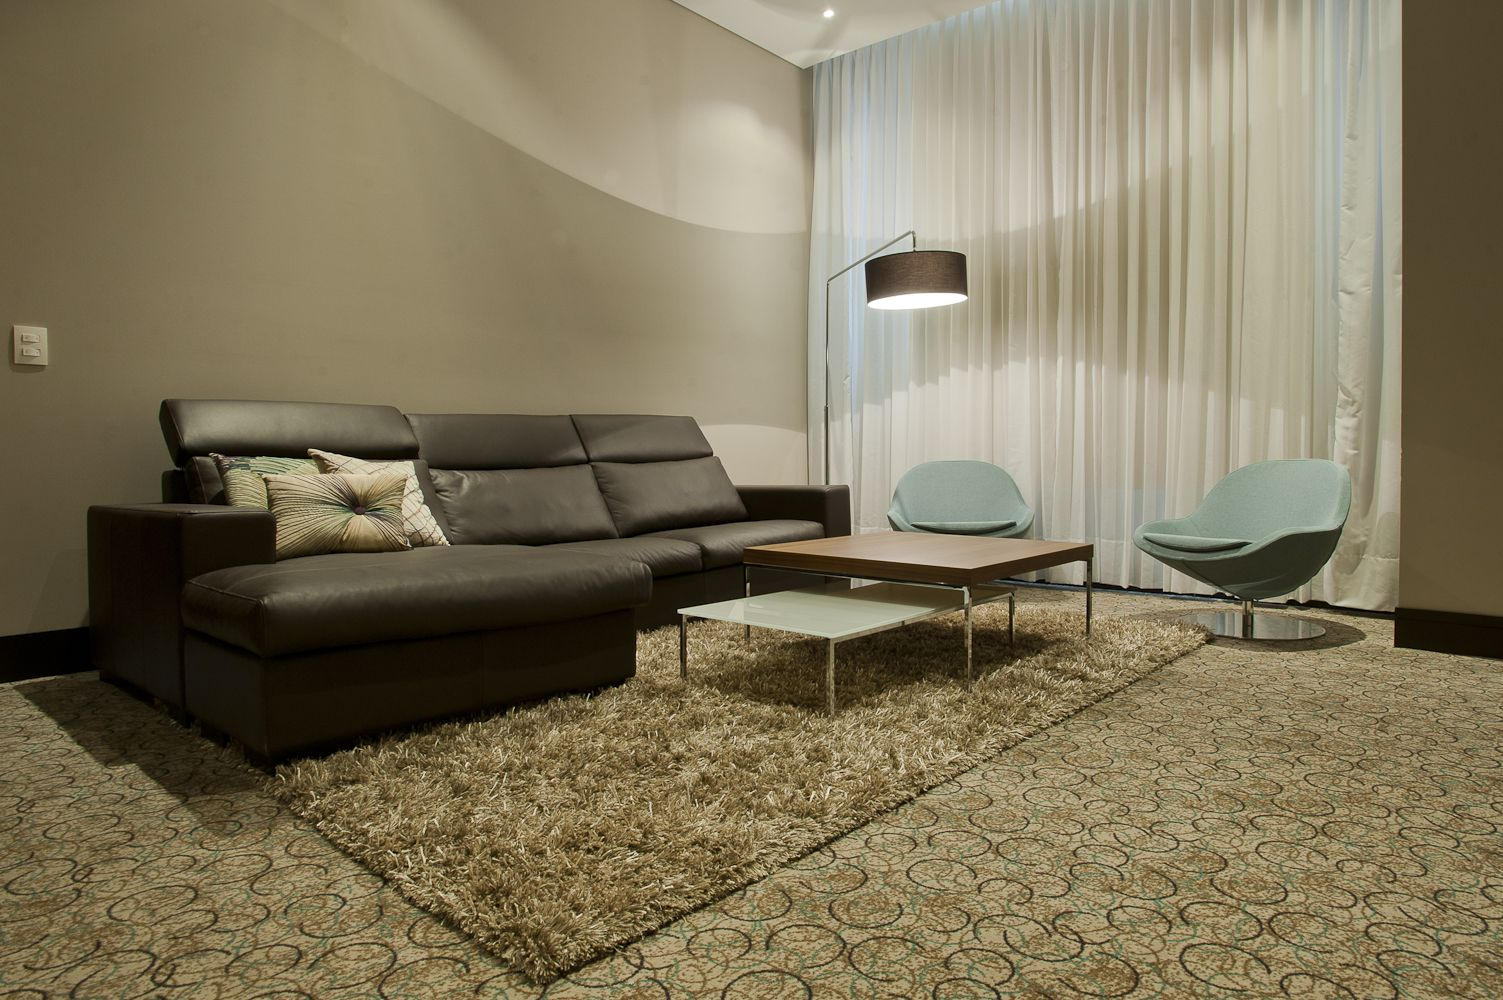 Boconcept nago sofa veneto chairs lugo coffee tables Beo concept